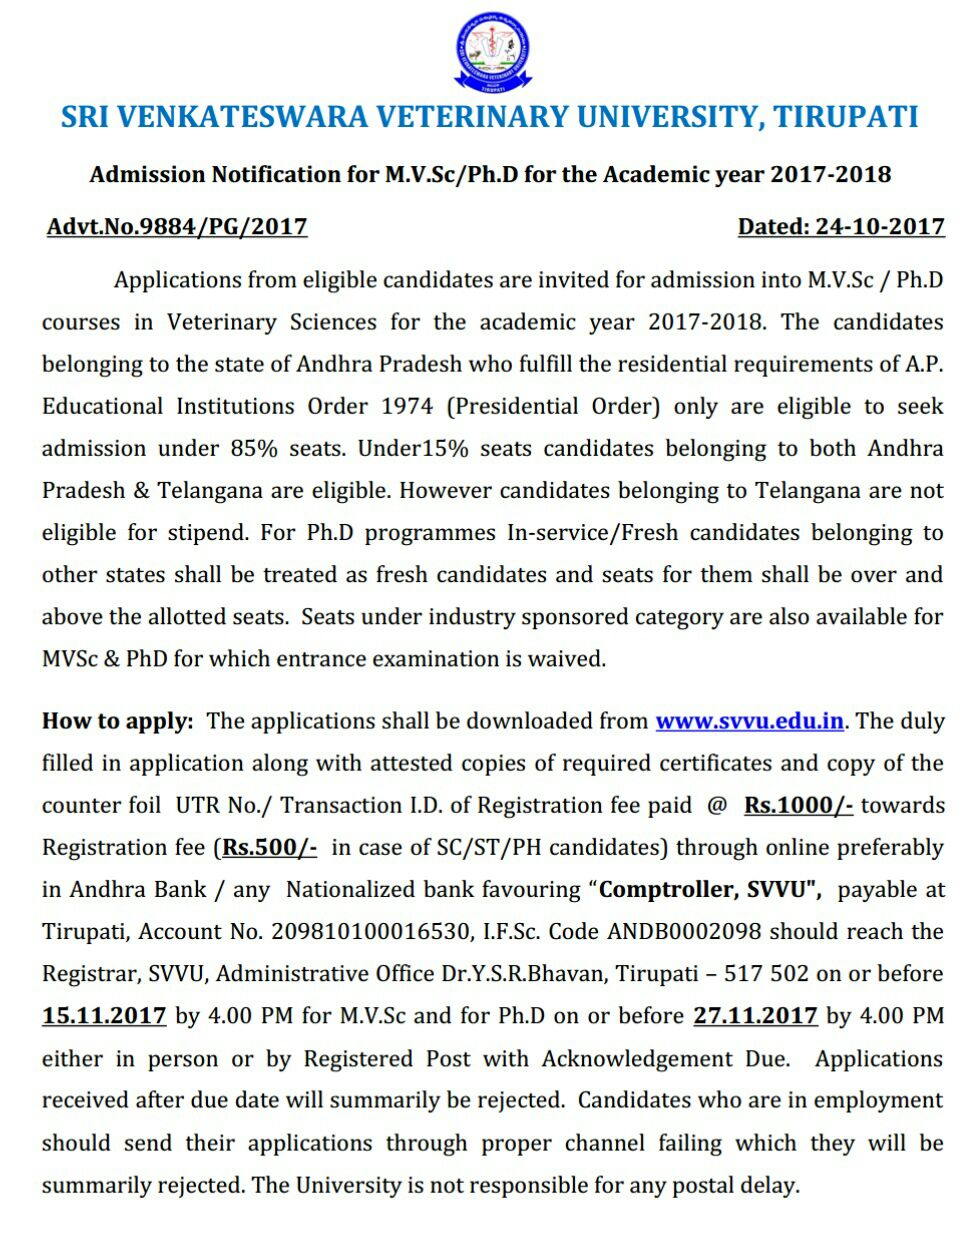 SVVU Distance M.V.Sc/Ph.D Admissions apply at svvu.edu.in